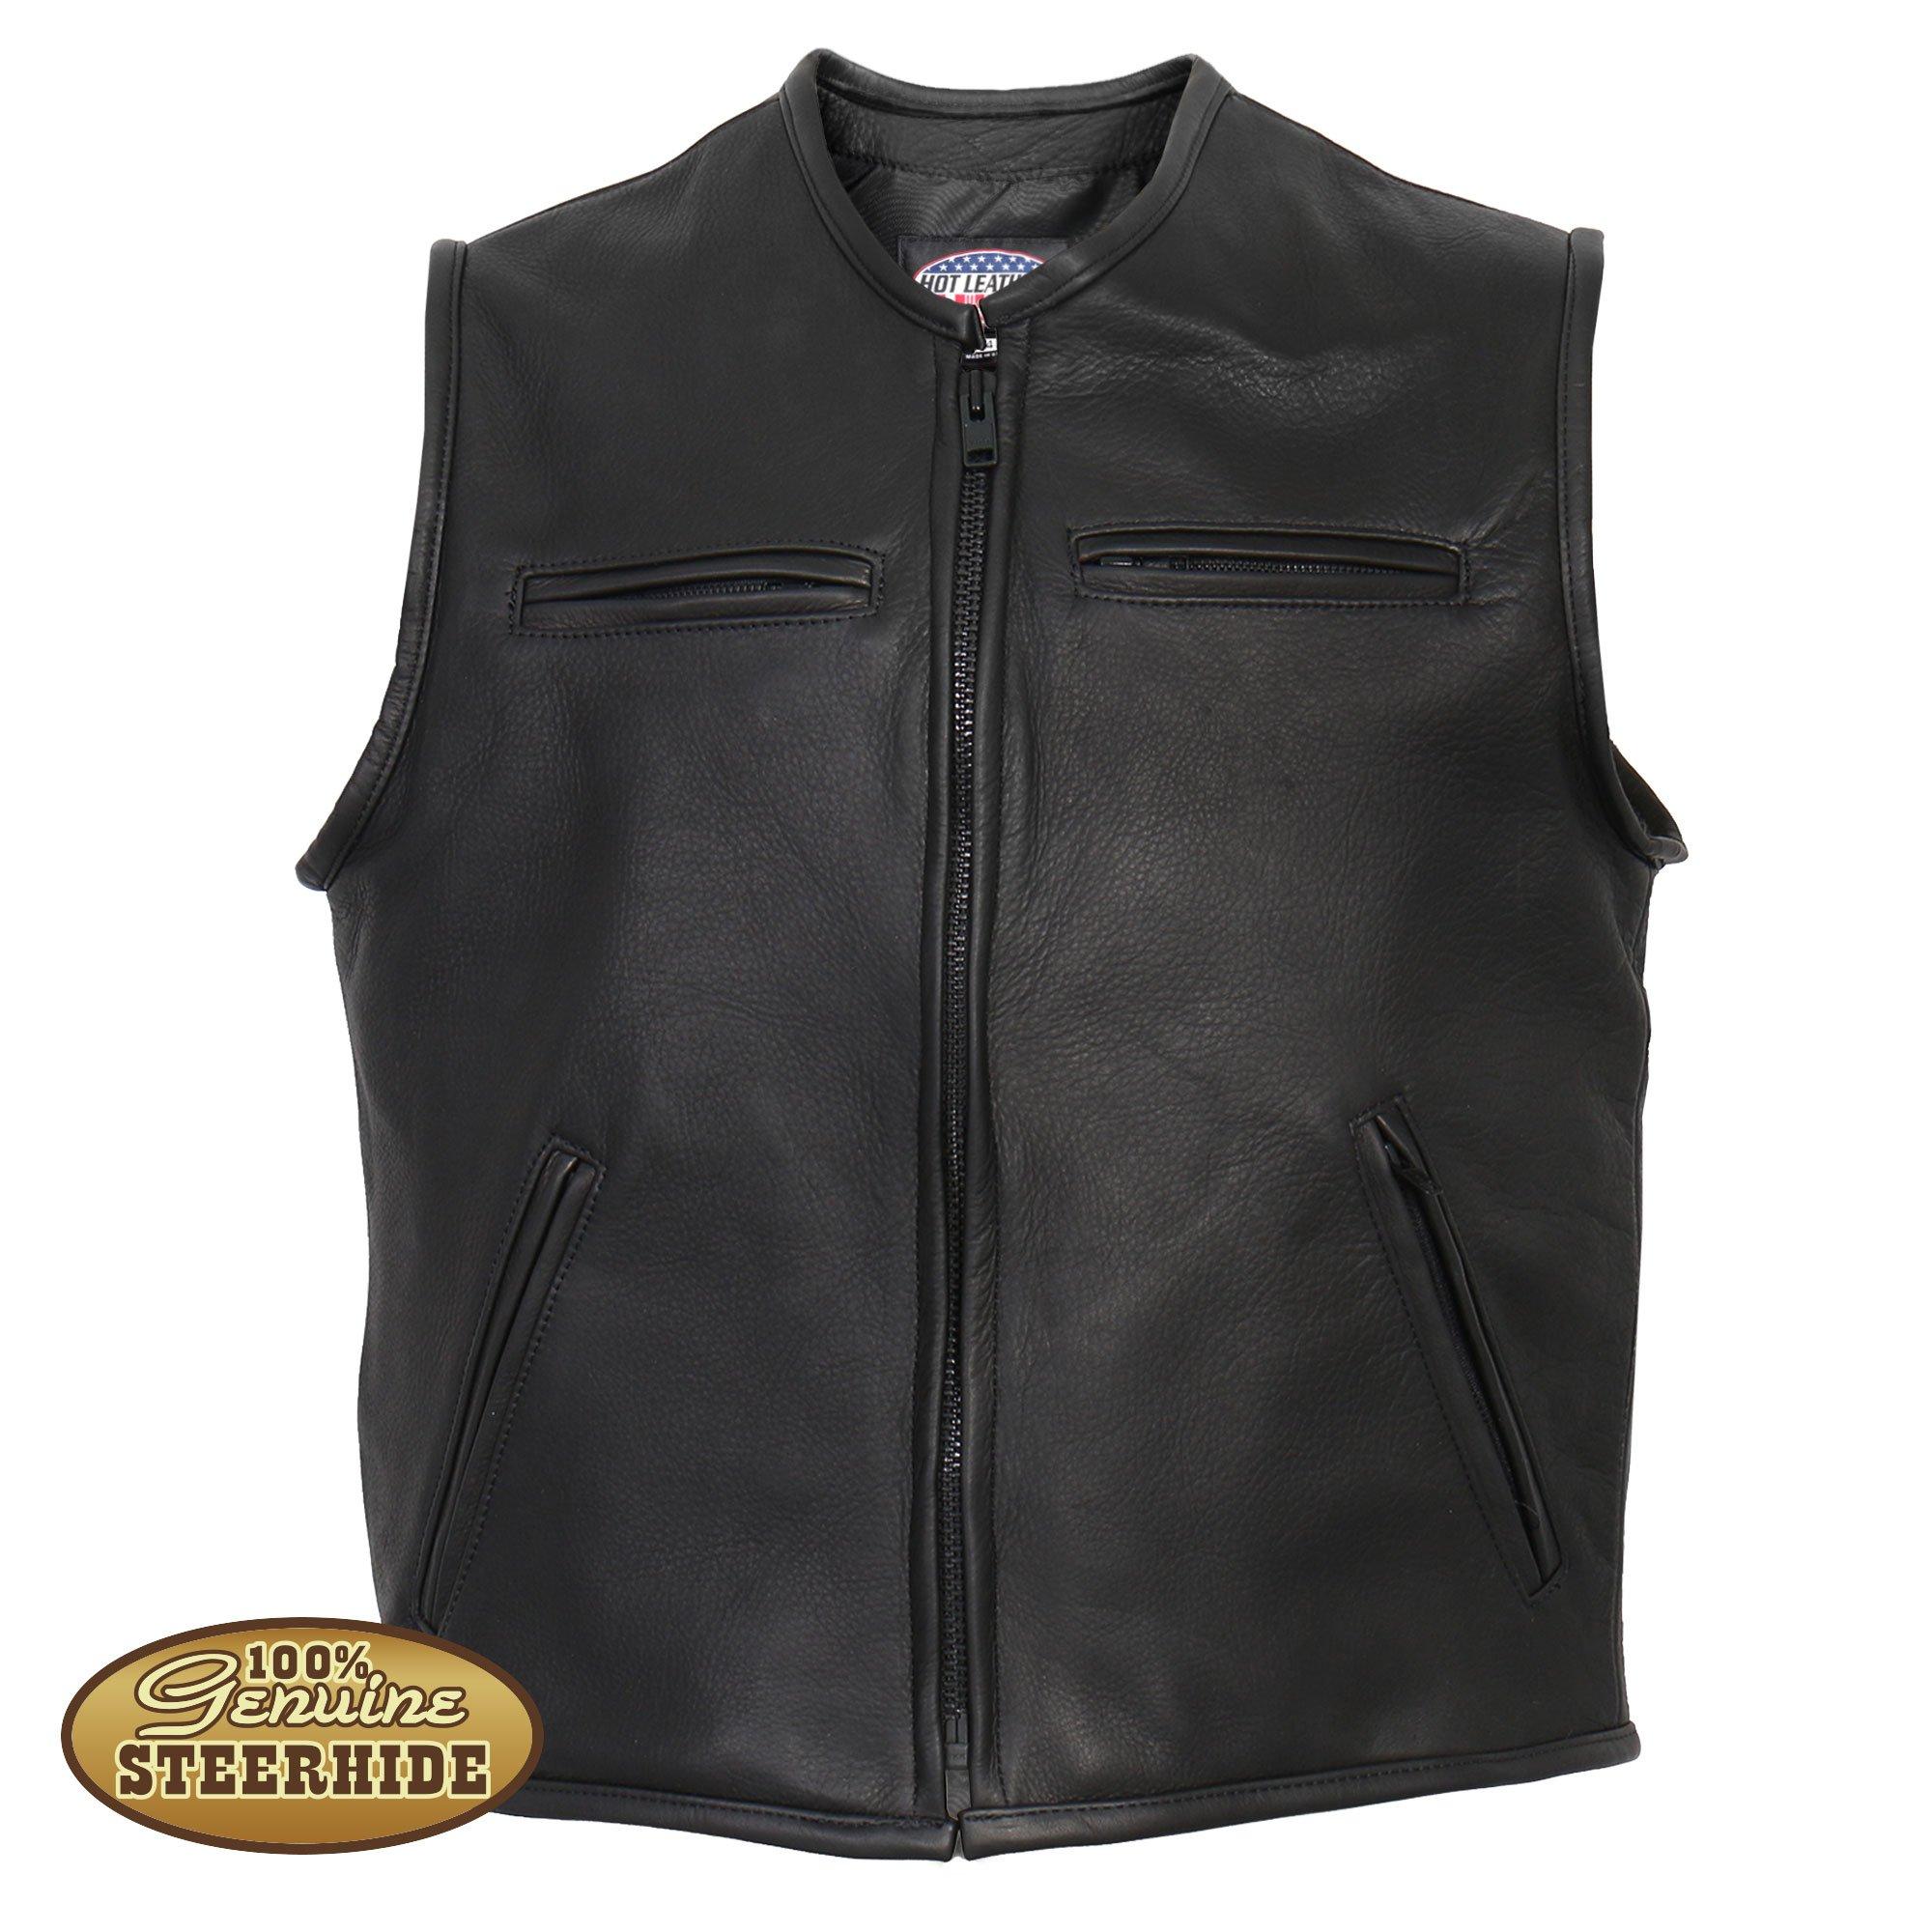 hot leathers menu0027s usa made premium steerhide leather vest umortjy